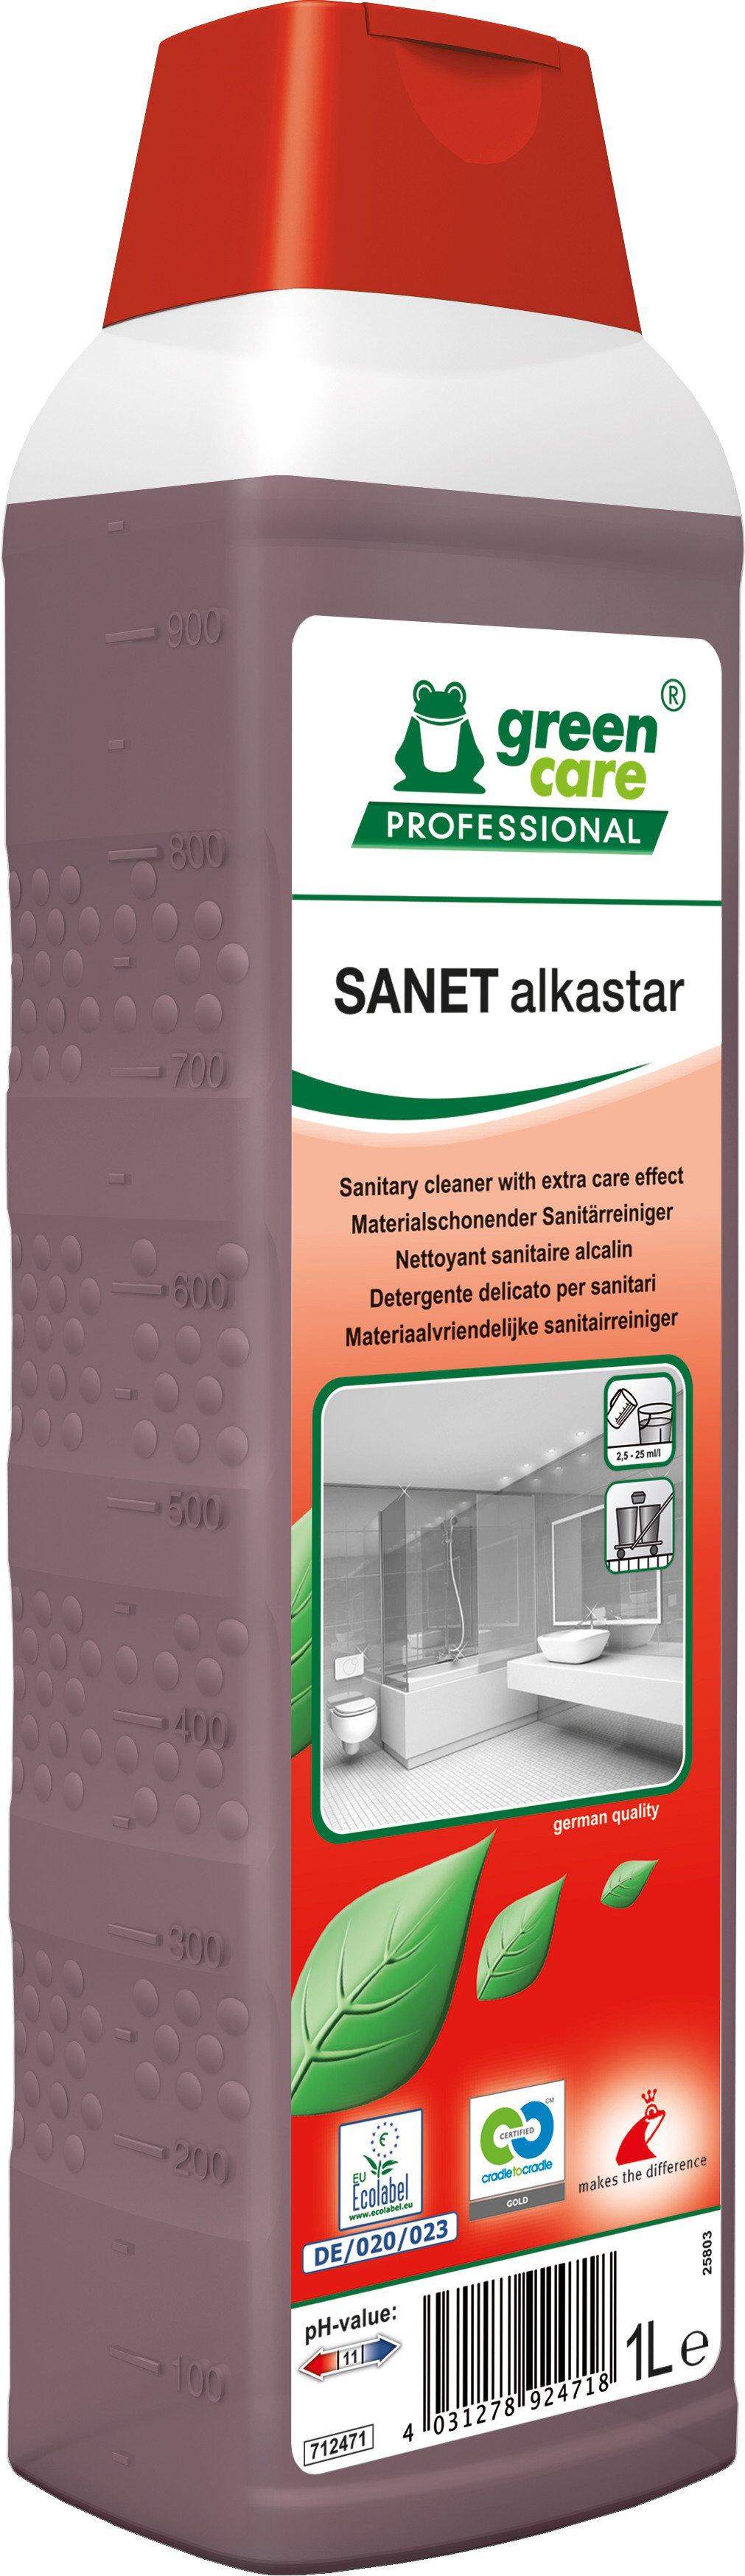 Green Care | Sanet alkastar | Fles 10 x 1 liter